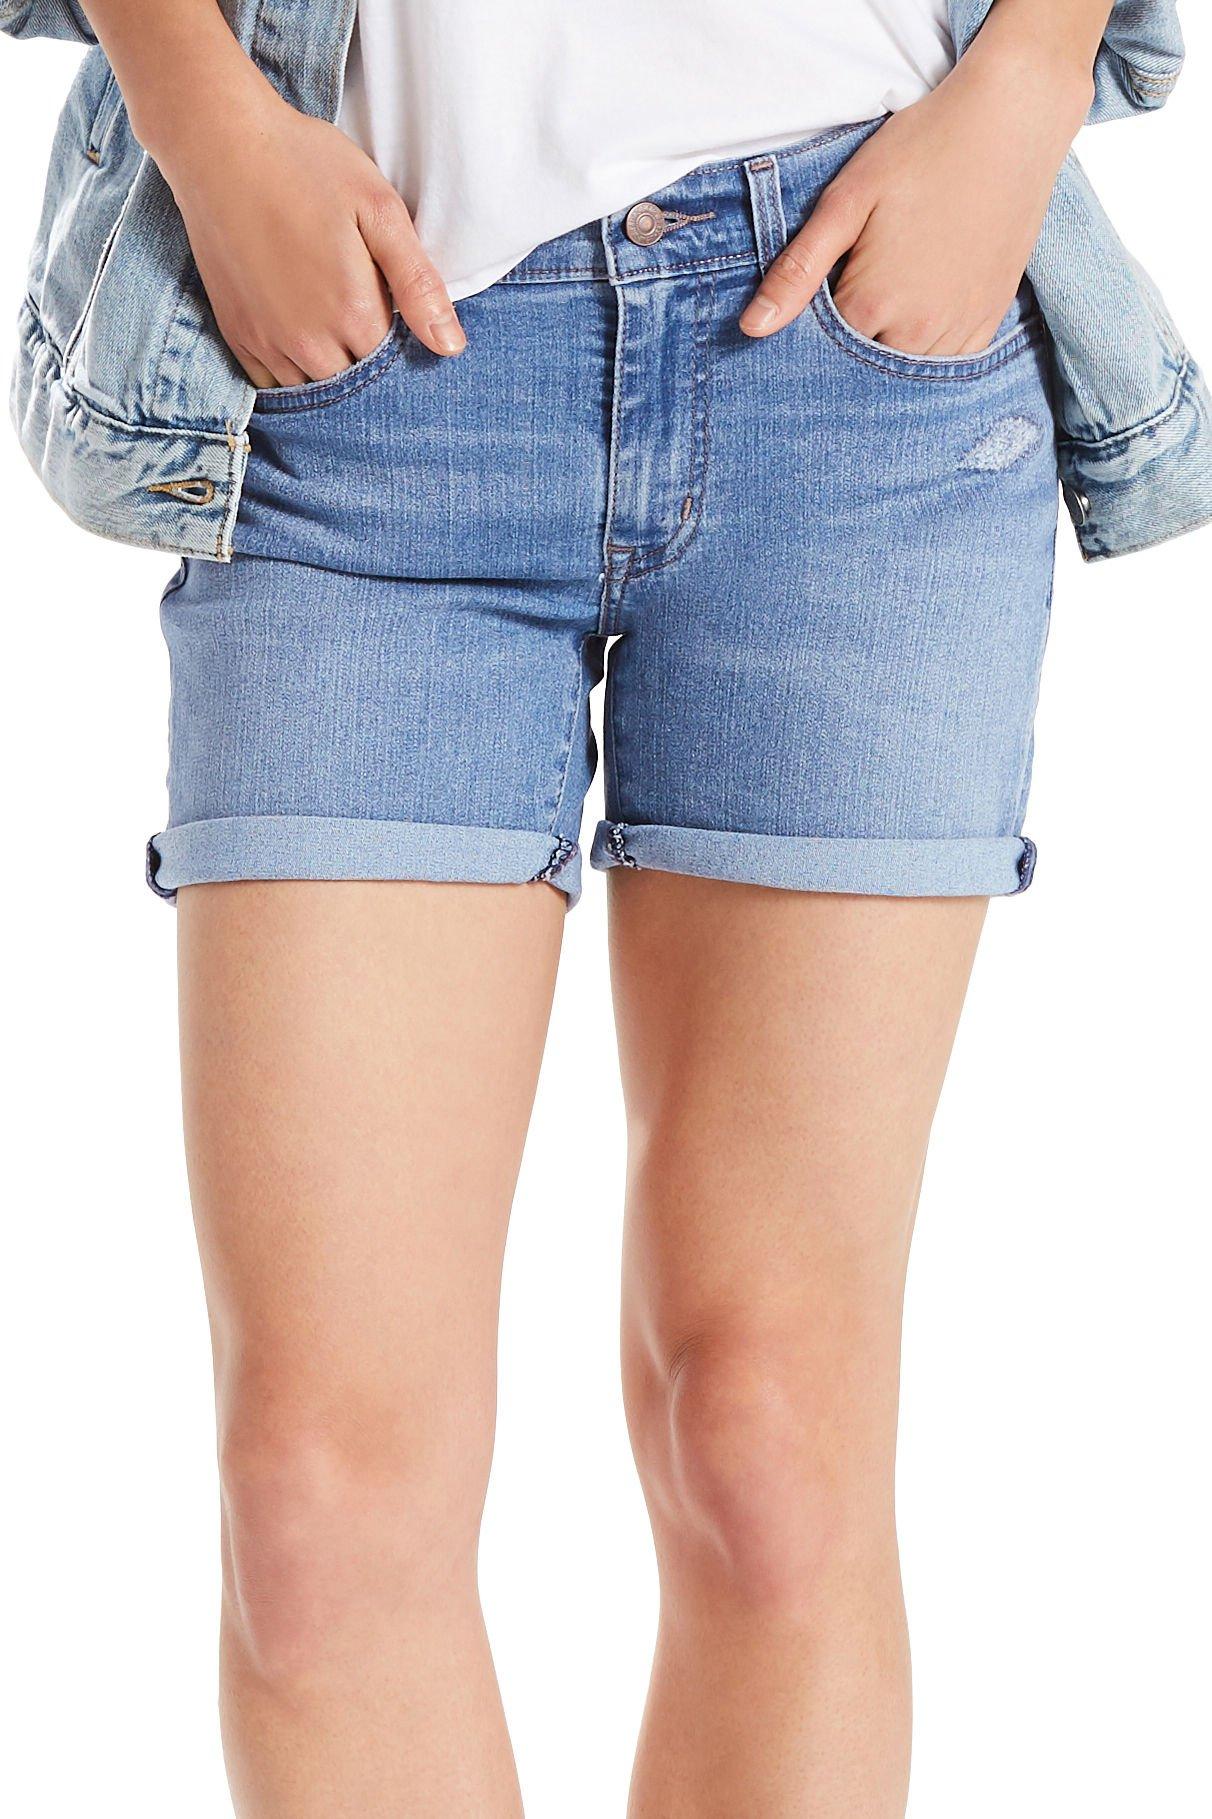 Levi's Women's Mid Length Shorts, Ready Set Indigo, 31 (US 12)